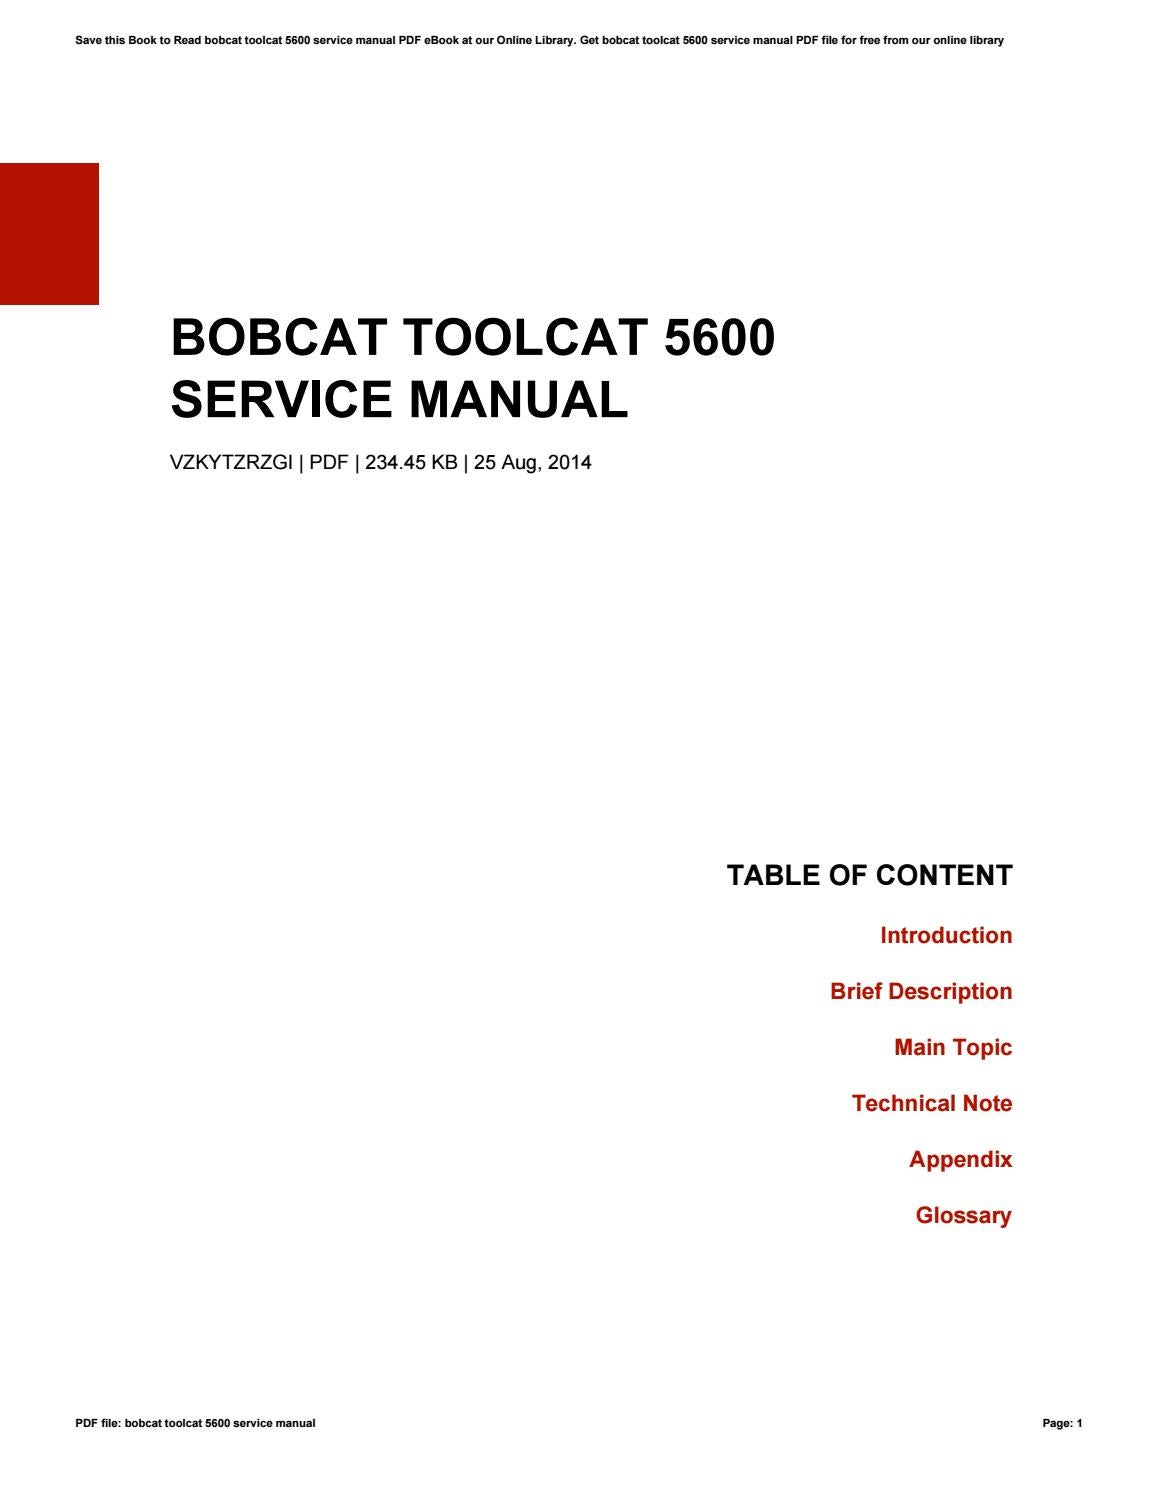 Bobcat toolcat 5600 service manual by RaymondVictor4238